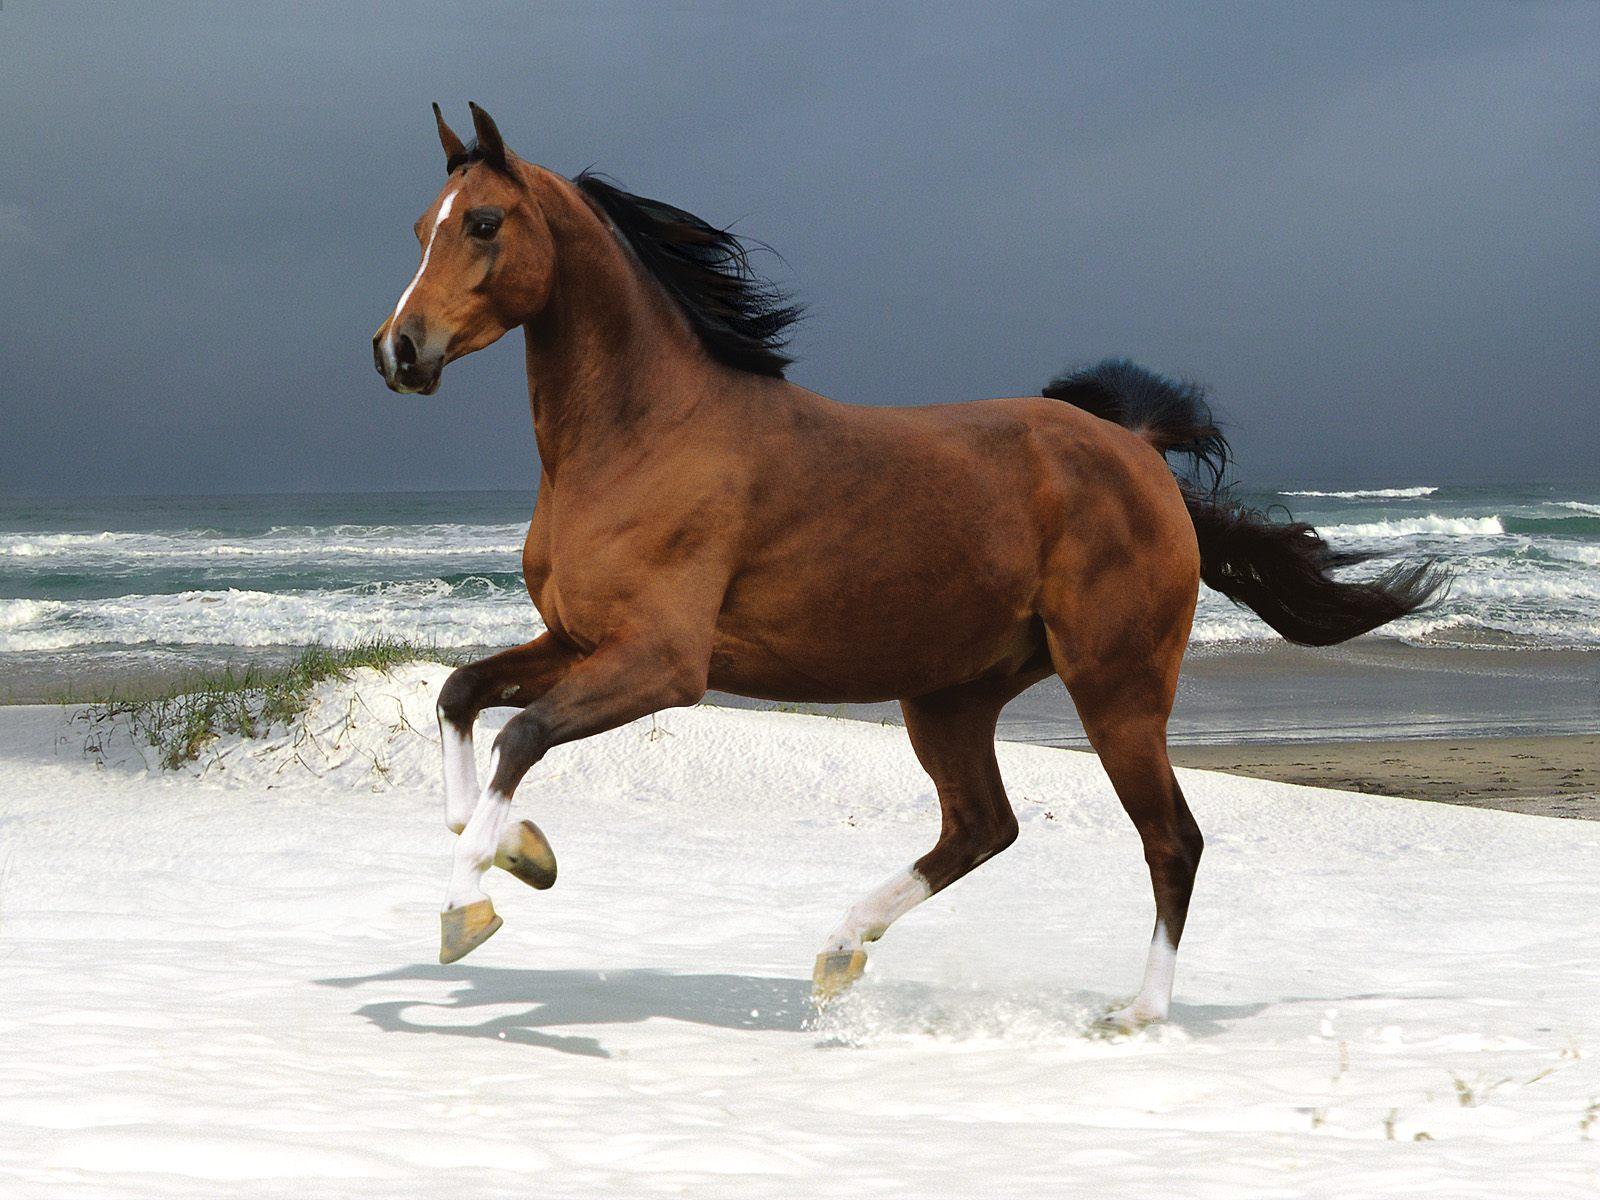 Cool   Wallpaper Horse Snow - beautiful+horse+wallpaper  Trends_100117.jpg